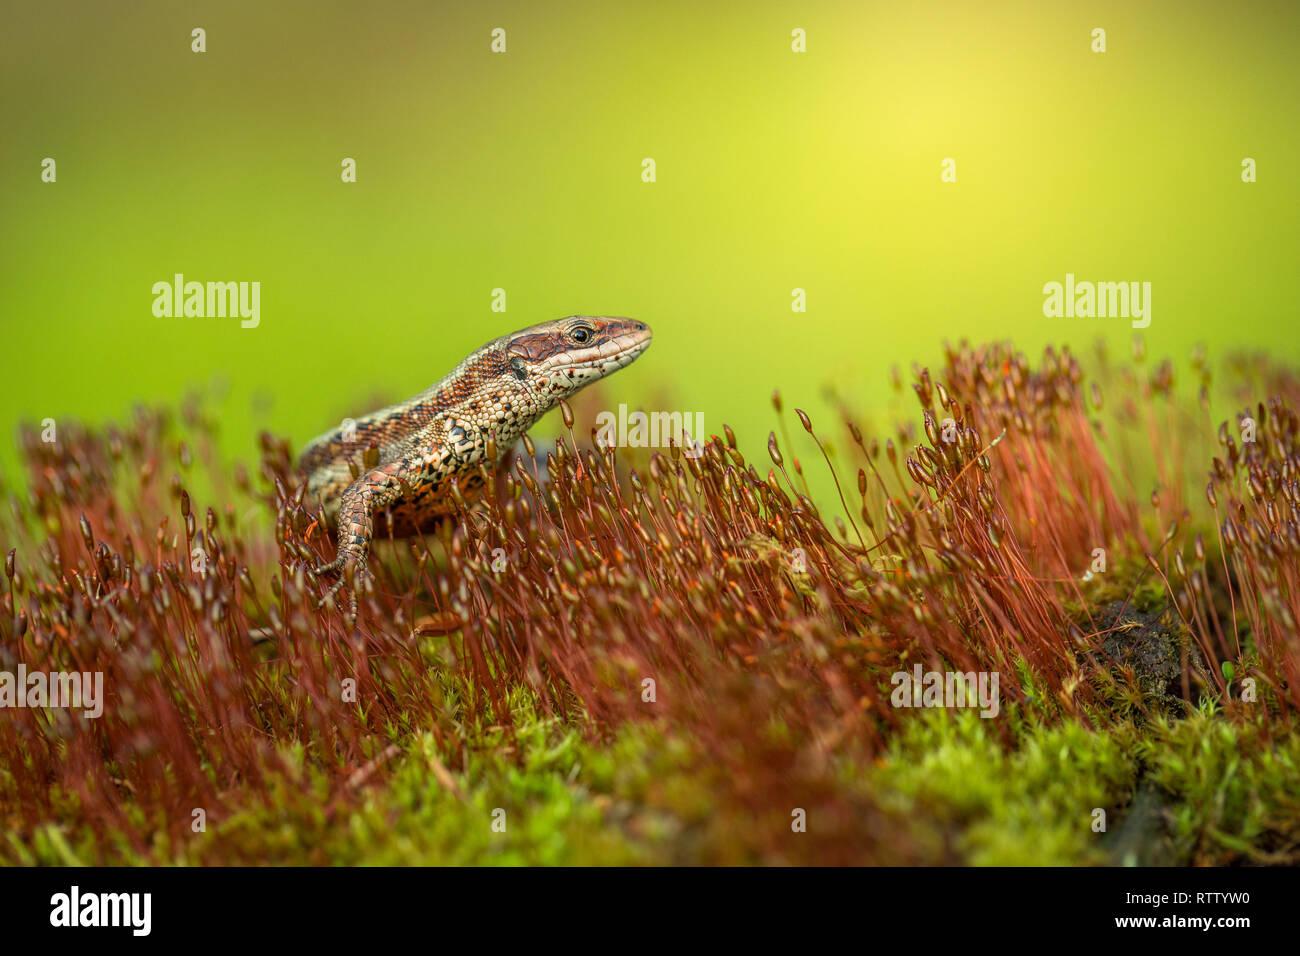 El lagarto común o ovíparos Zootoca vivipara en República Checa Foto de stock